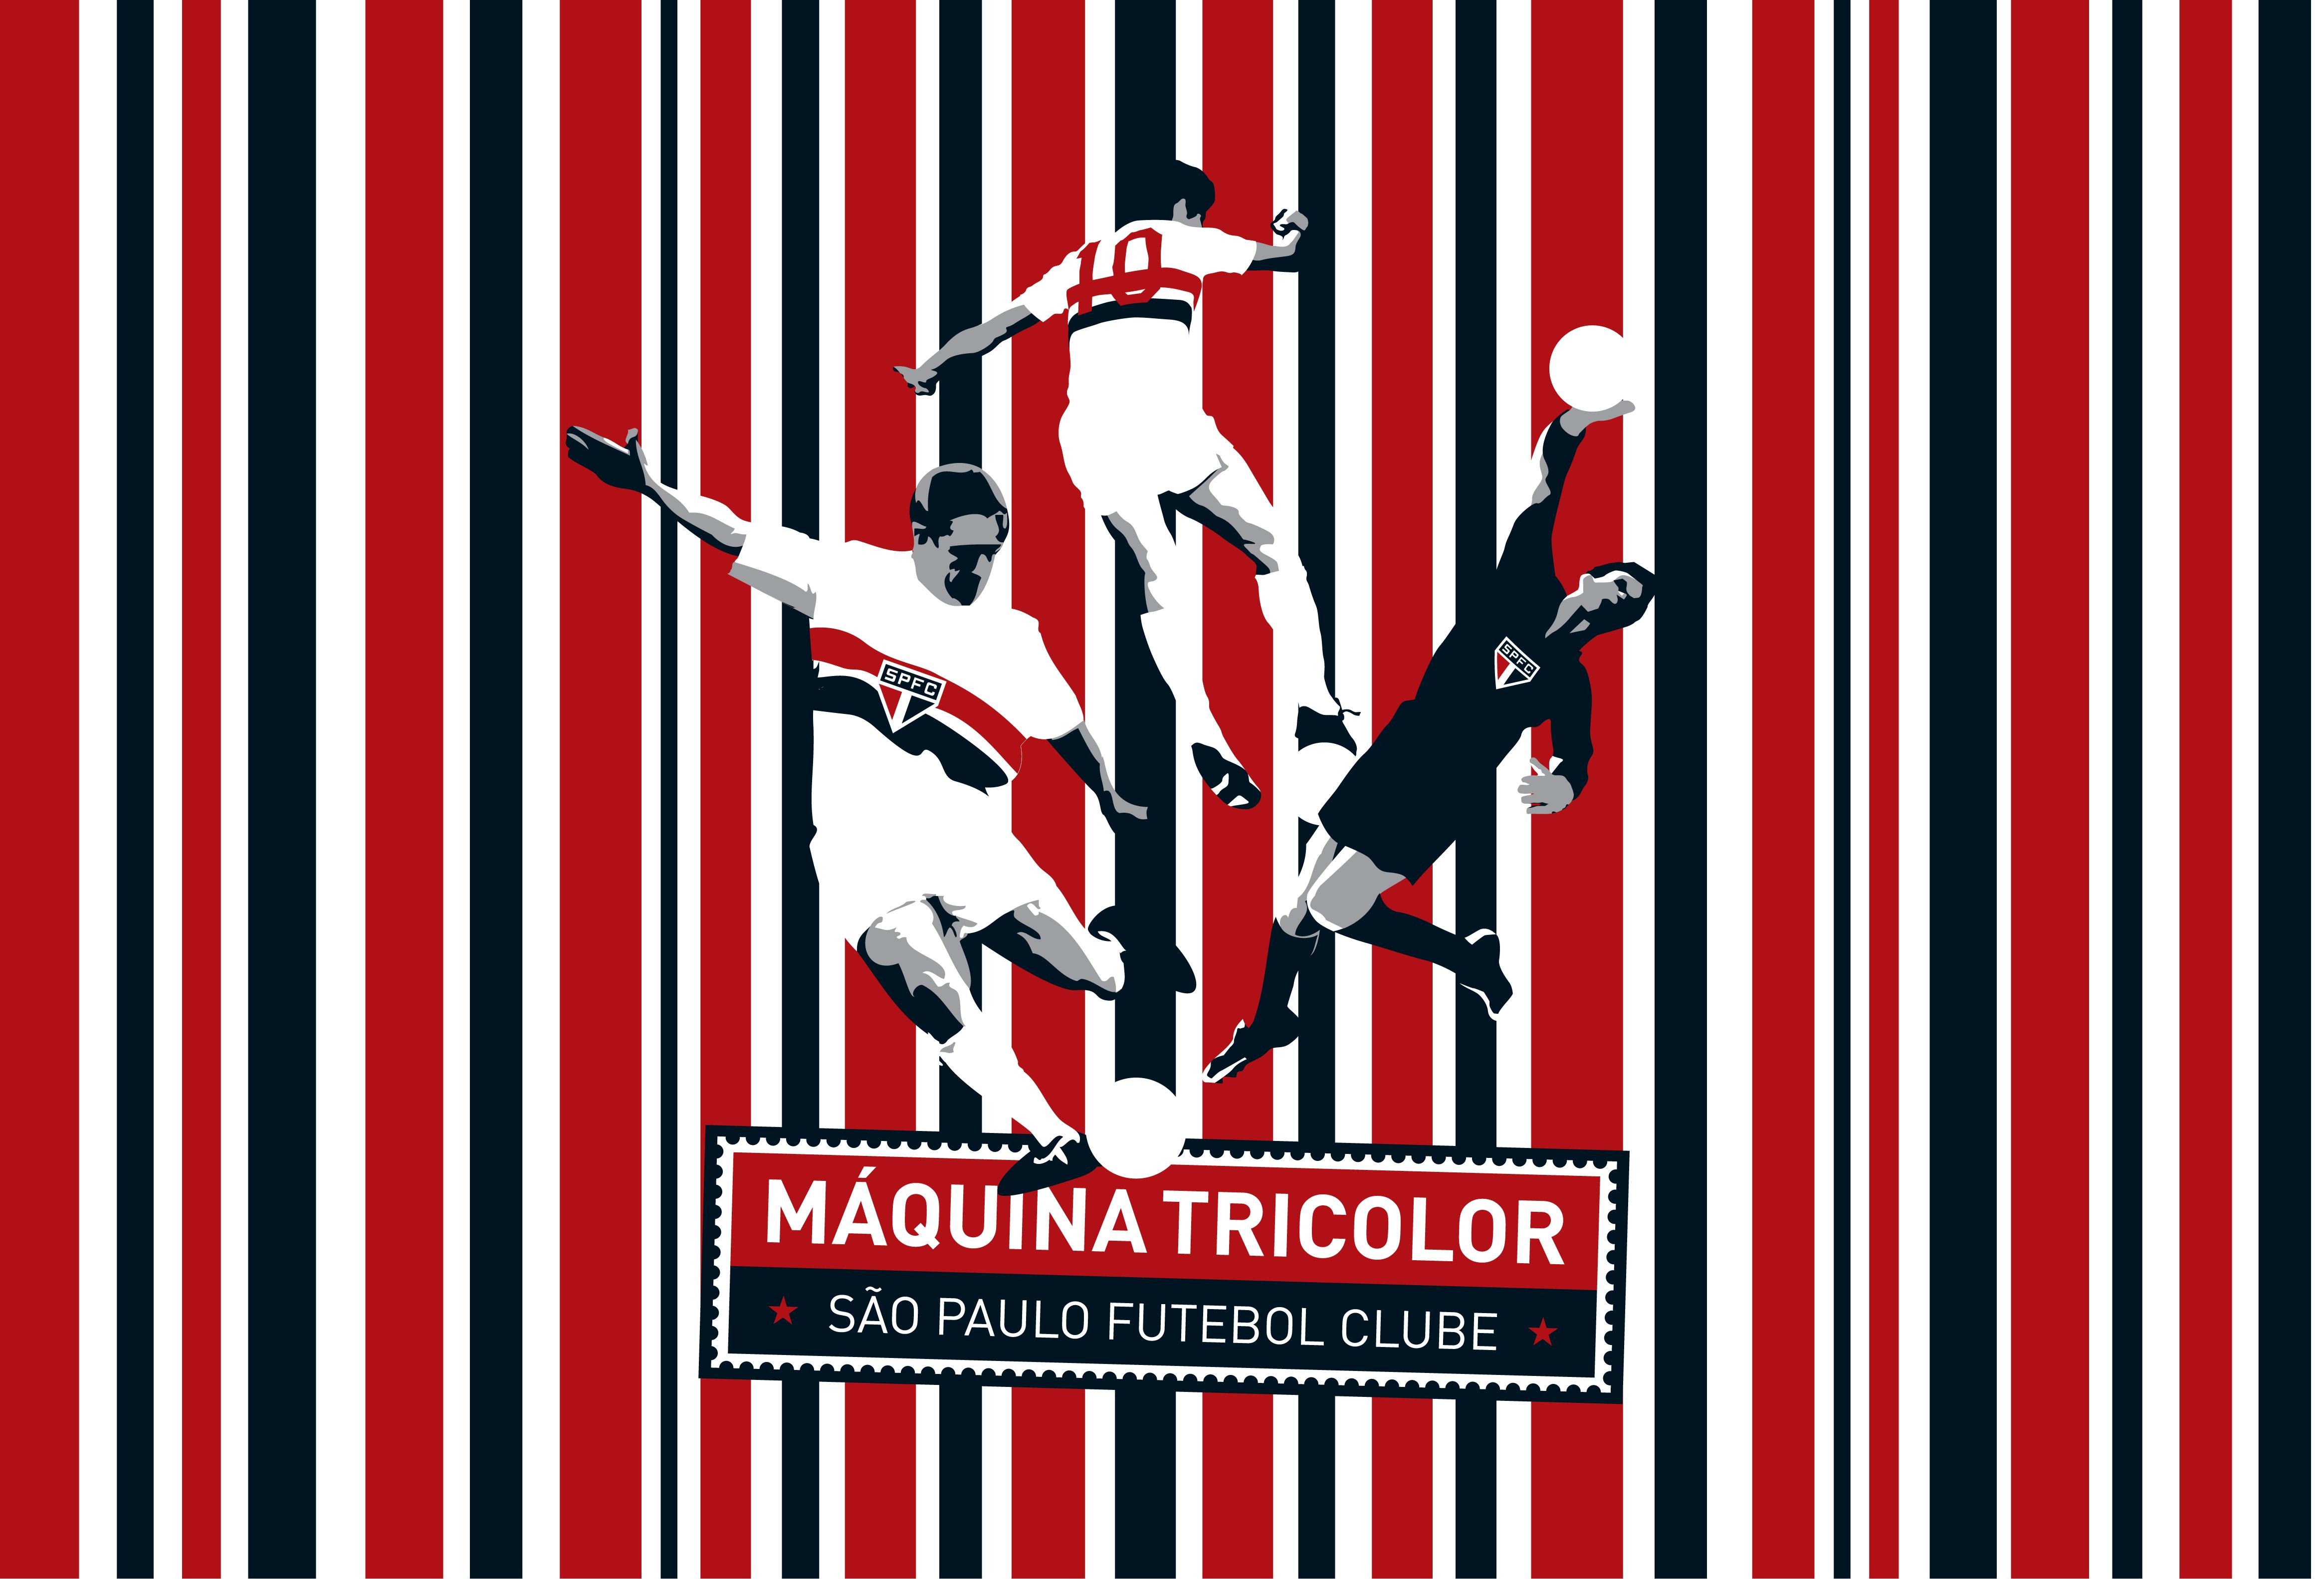 Sao Paulo FC Wallpaper 11   4659 X 3165 stmednet 4659x3165